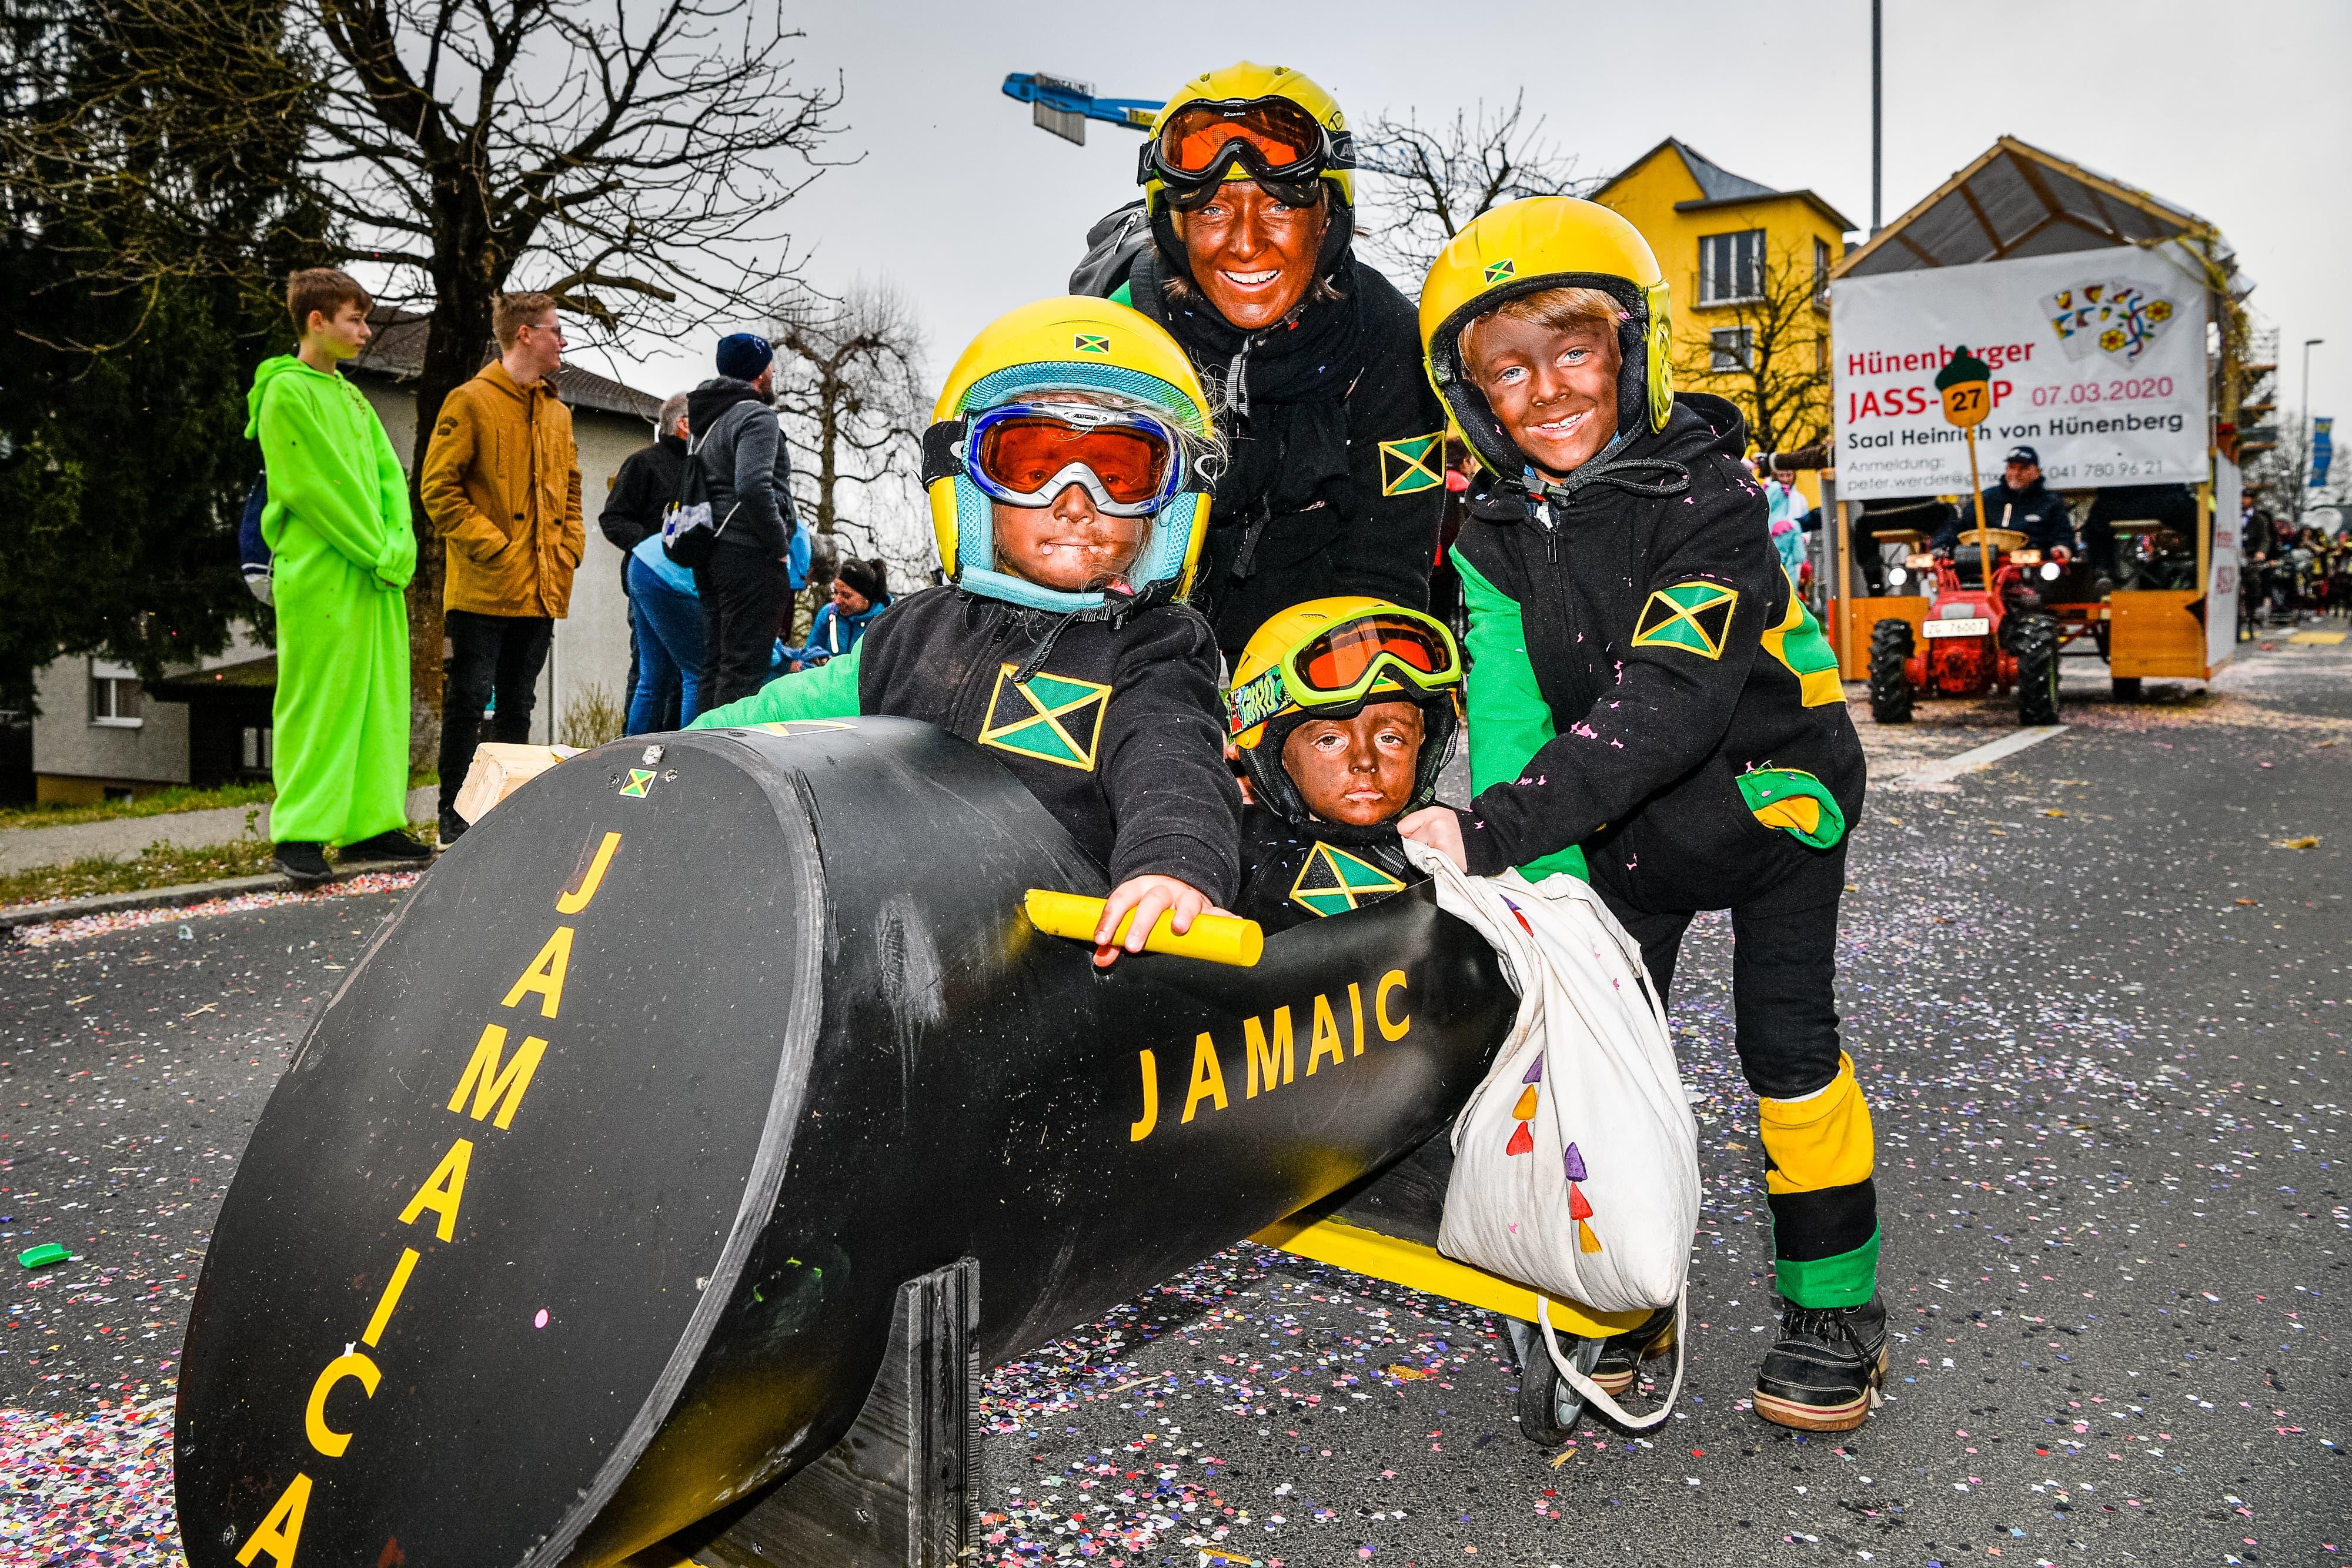 Diese Bobmannschaft aus Jamaica kann sich sehen lassen - tat sie dann auch am Hünenberger Fasnachtsumzug.